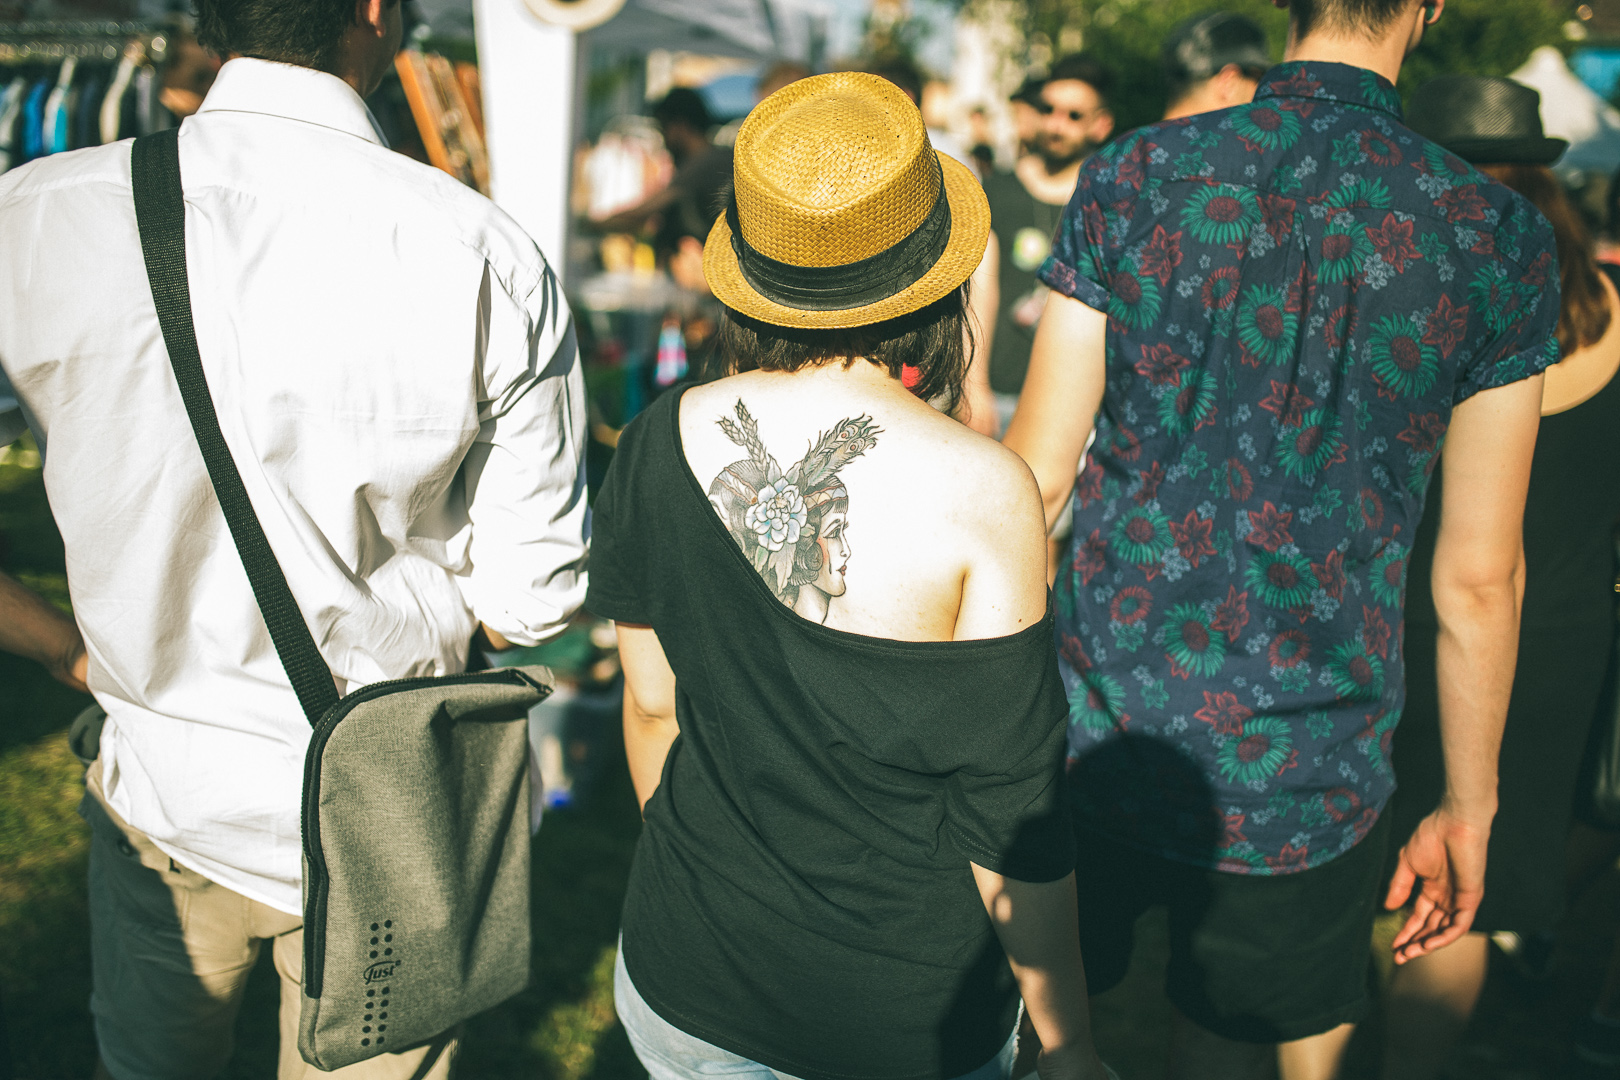 20150602_photo_ksaversinkar_handmade_festival_guastalla-IMG_8240.jpg